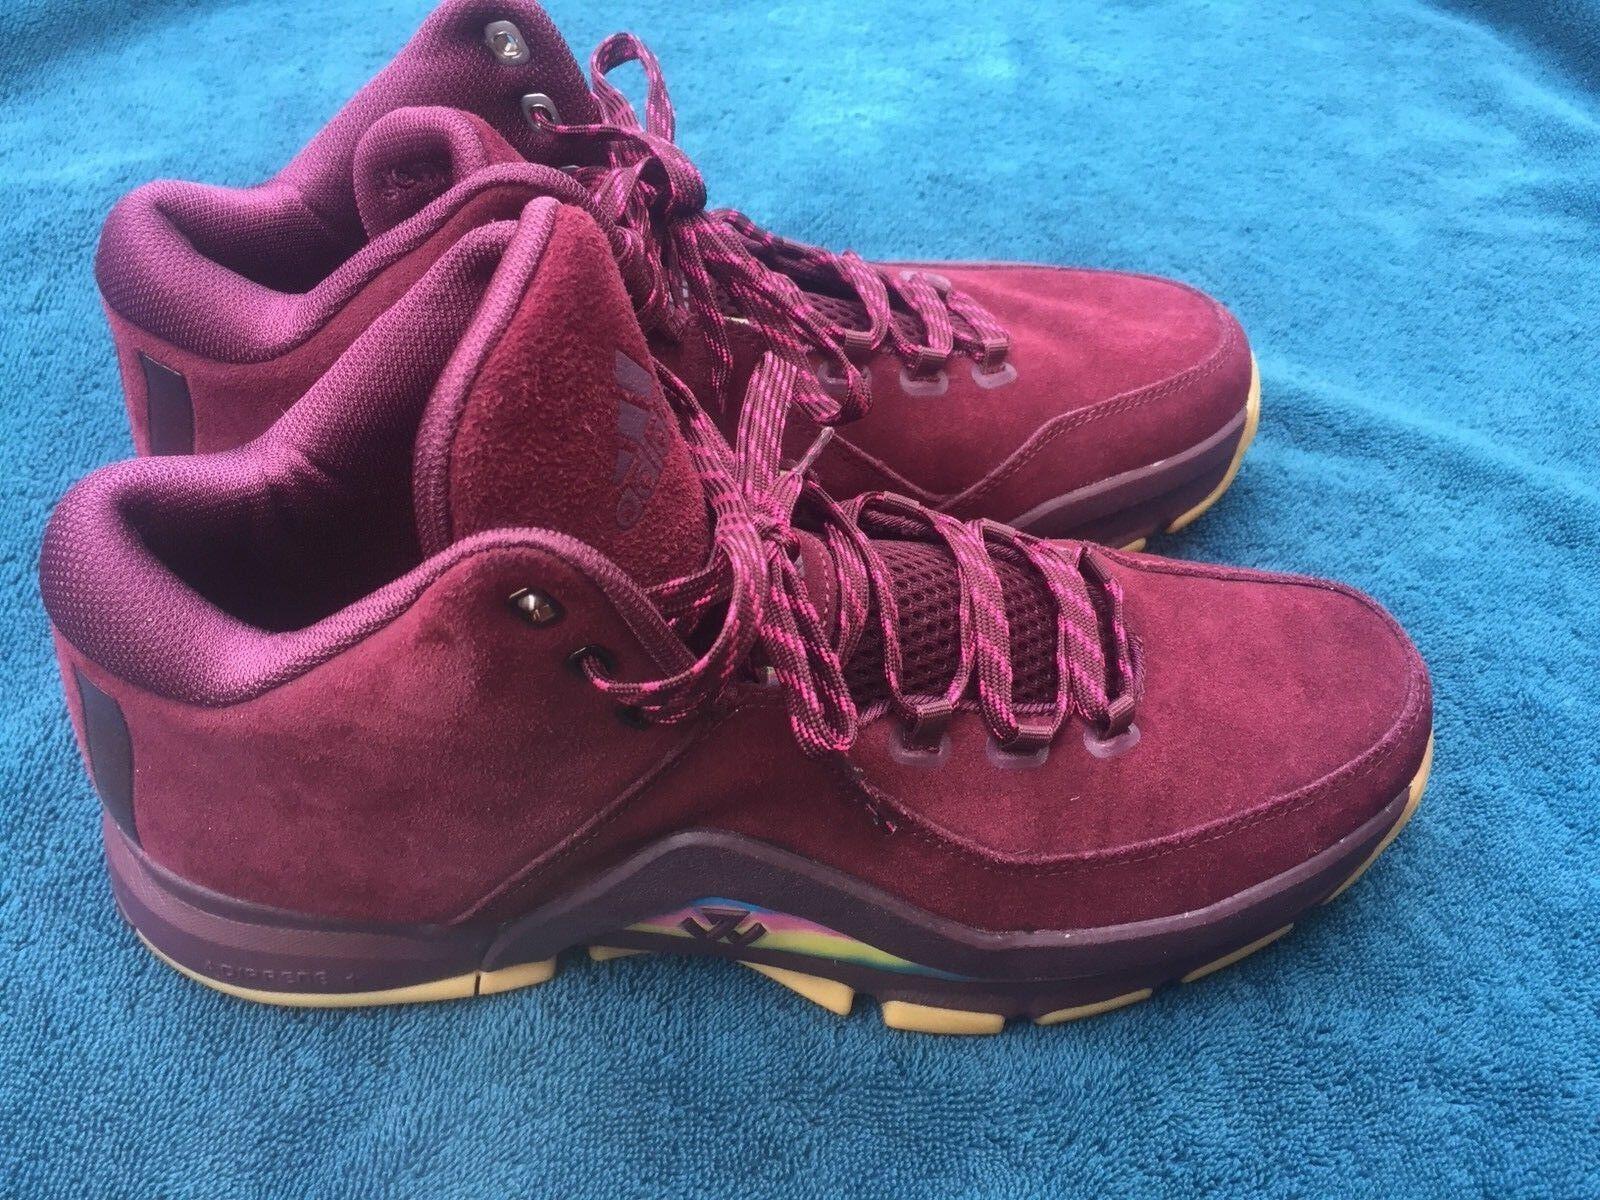 Adidas J Wall 2 Basketball Shoes - Men's B39529 size: 11 - ( B39529 Men's ) - MRSP $120 4433c4